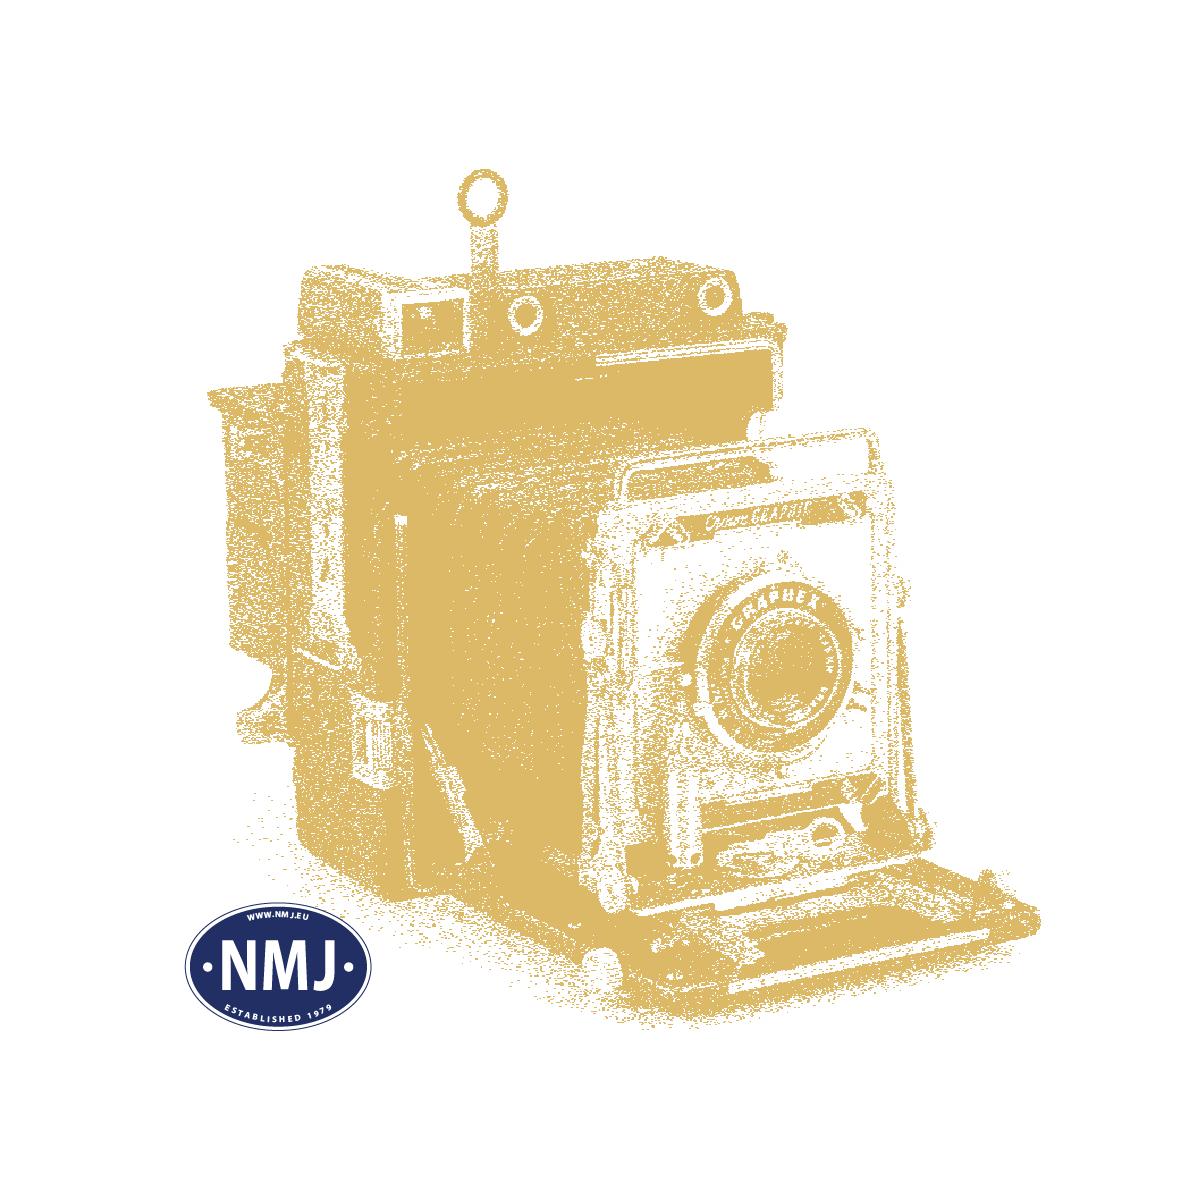 NMJK220919 - Basic Airbrushkurs 22/09-2019